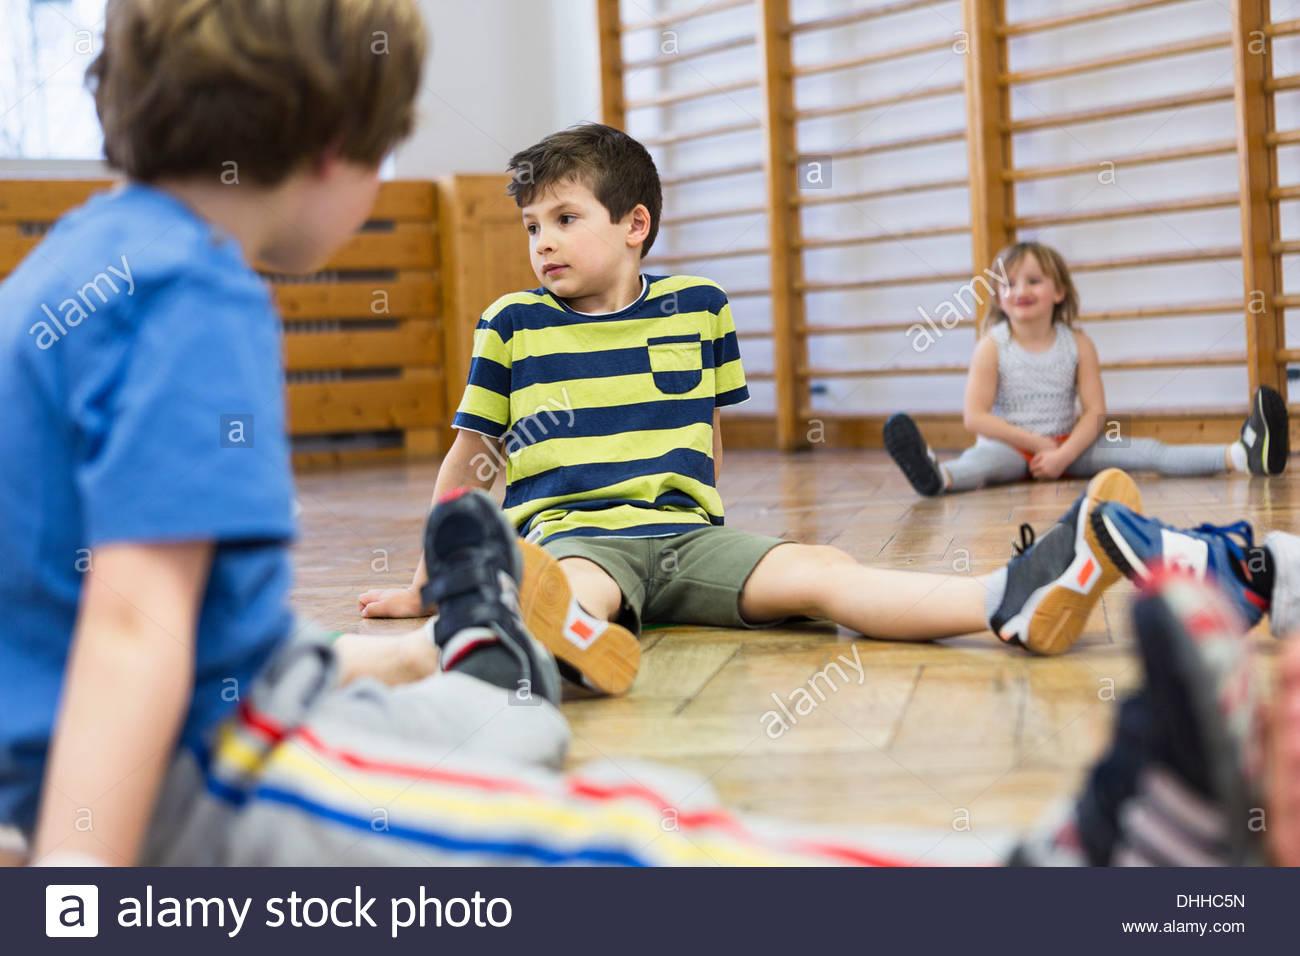 Children sitting on wooden floor, legs apart - Stock Image